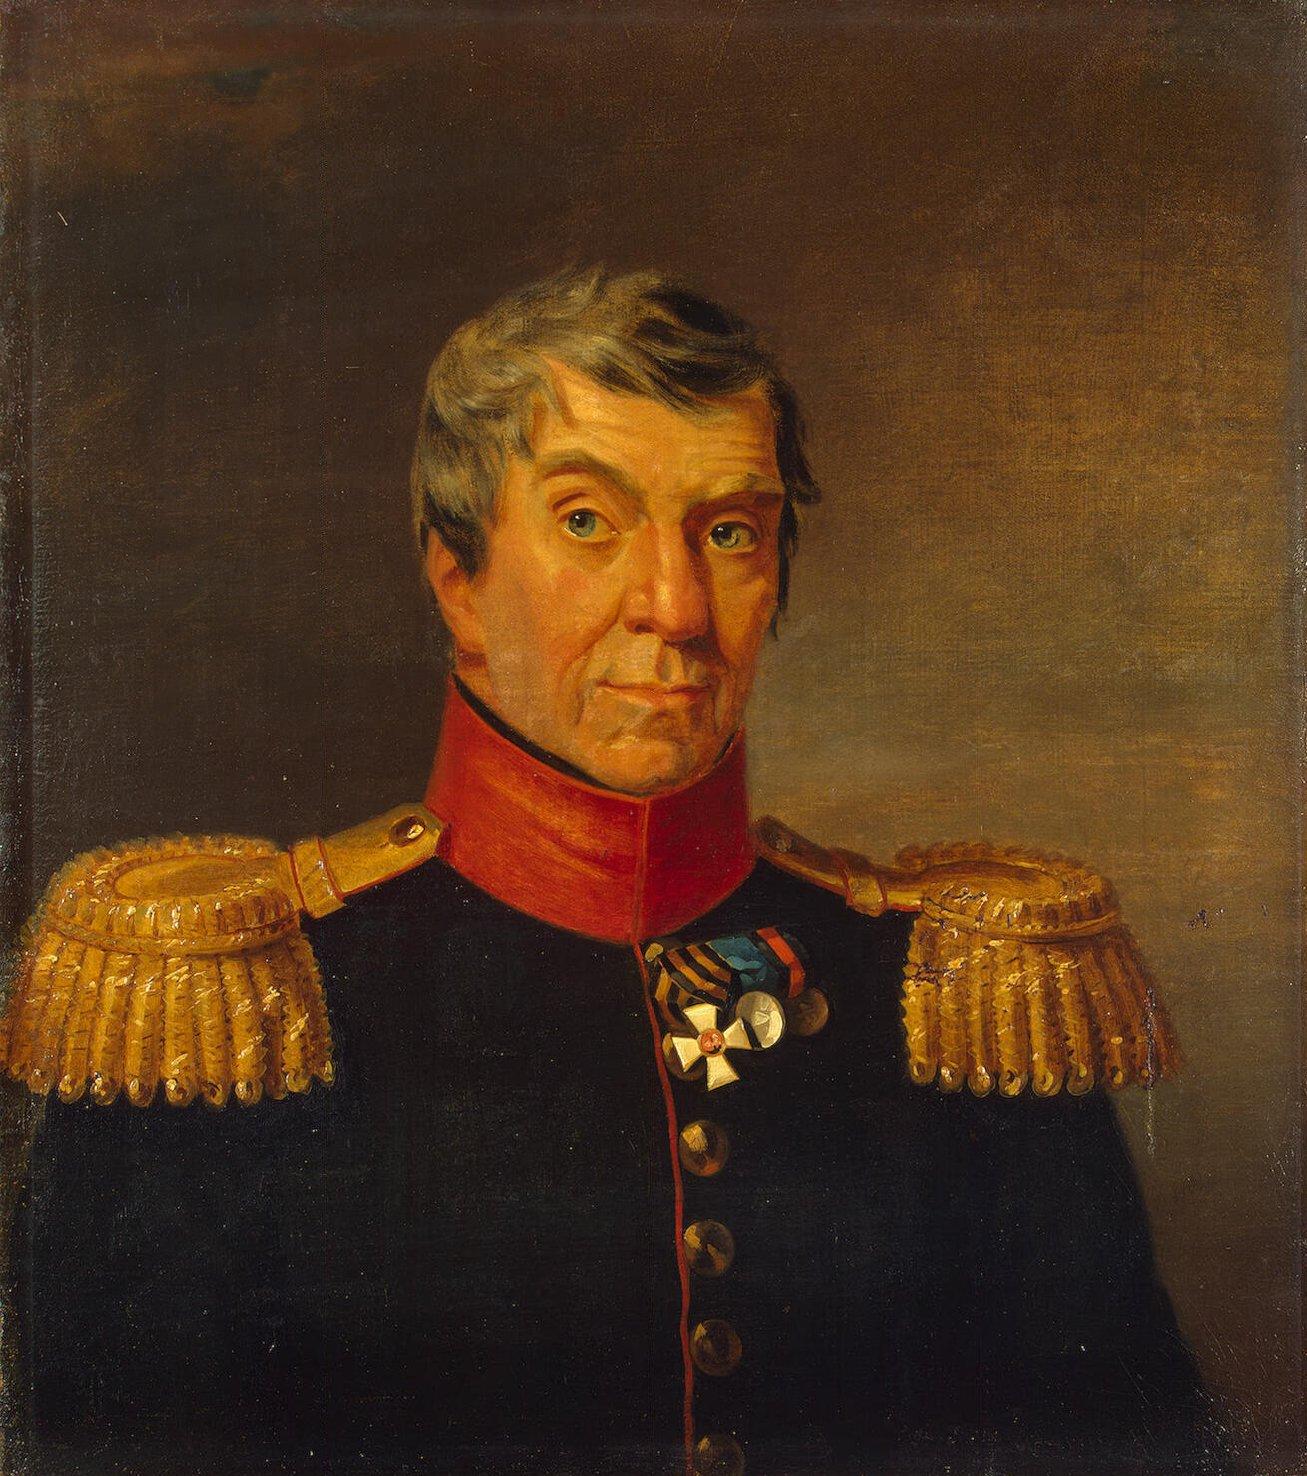 Шкапский, Михаил Андреевич